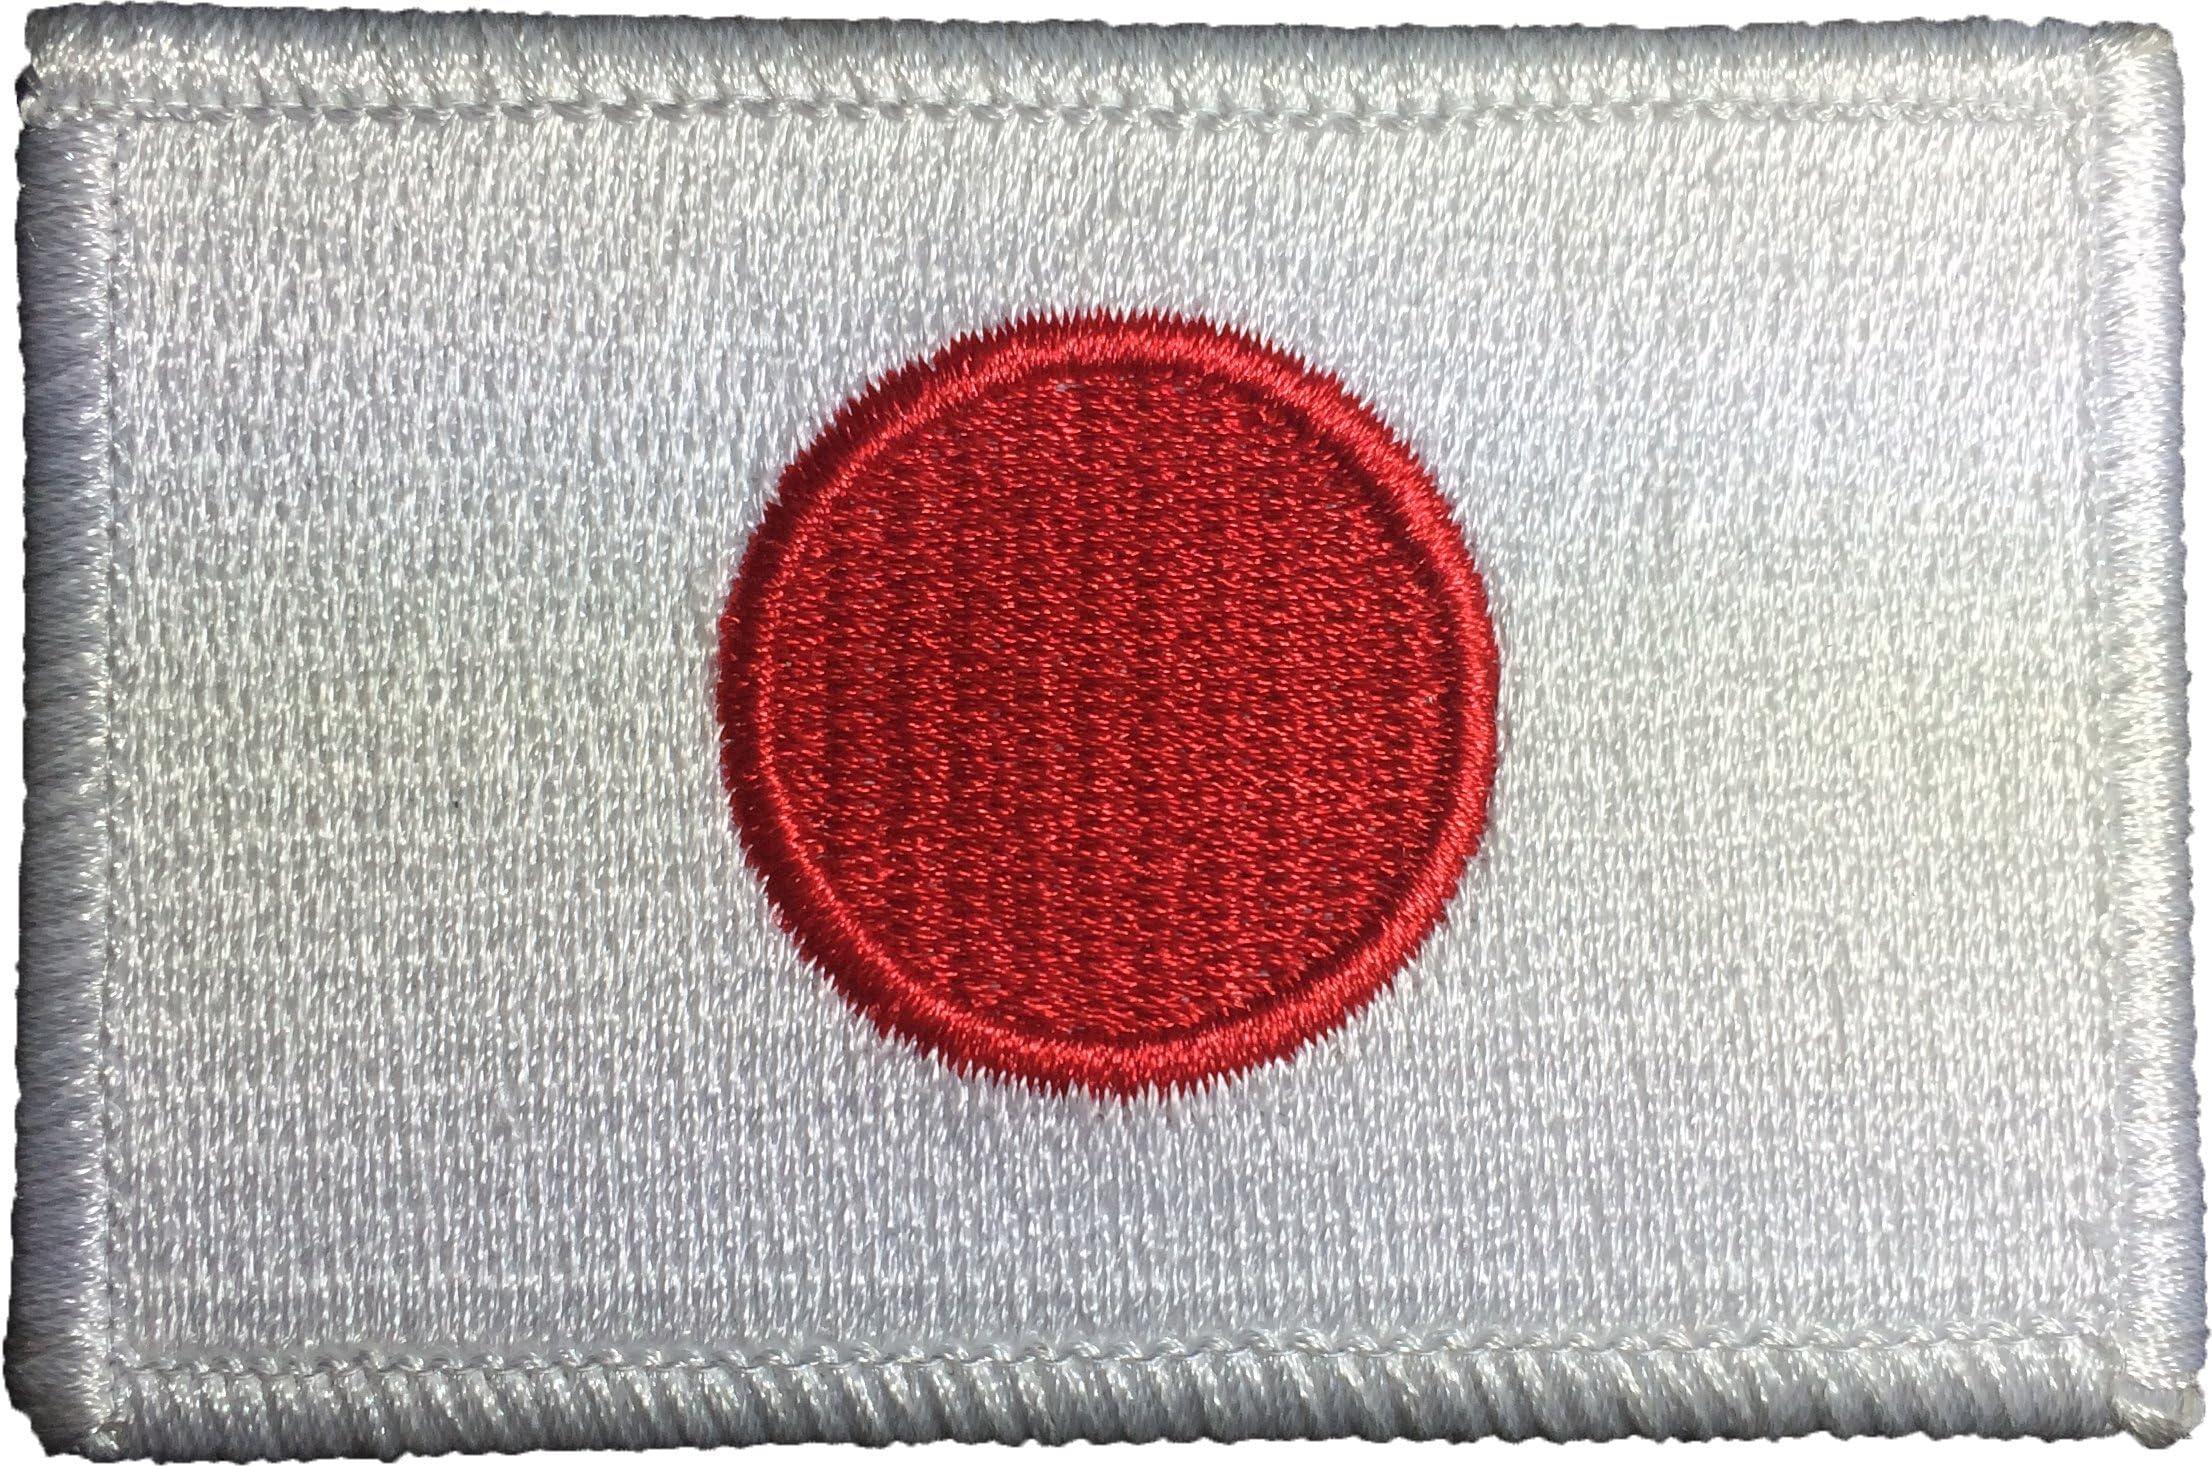 JAPAN Flag Patch With VELCRO® Brand Fastener  Military Tactical Shoulder Emblem